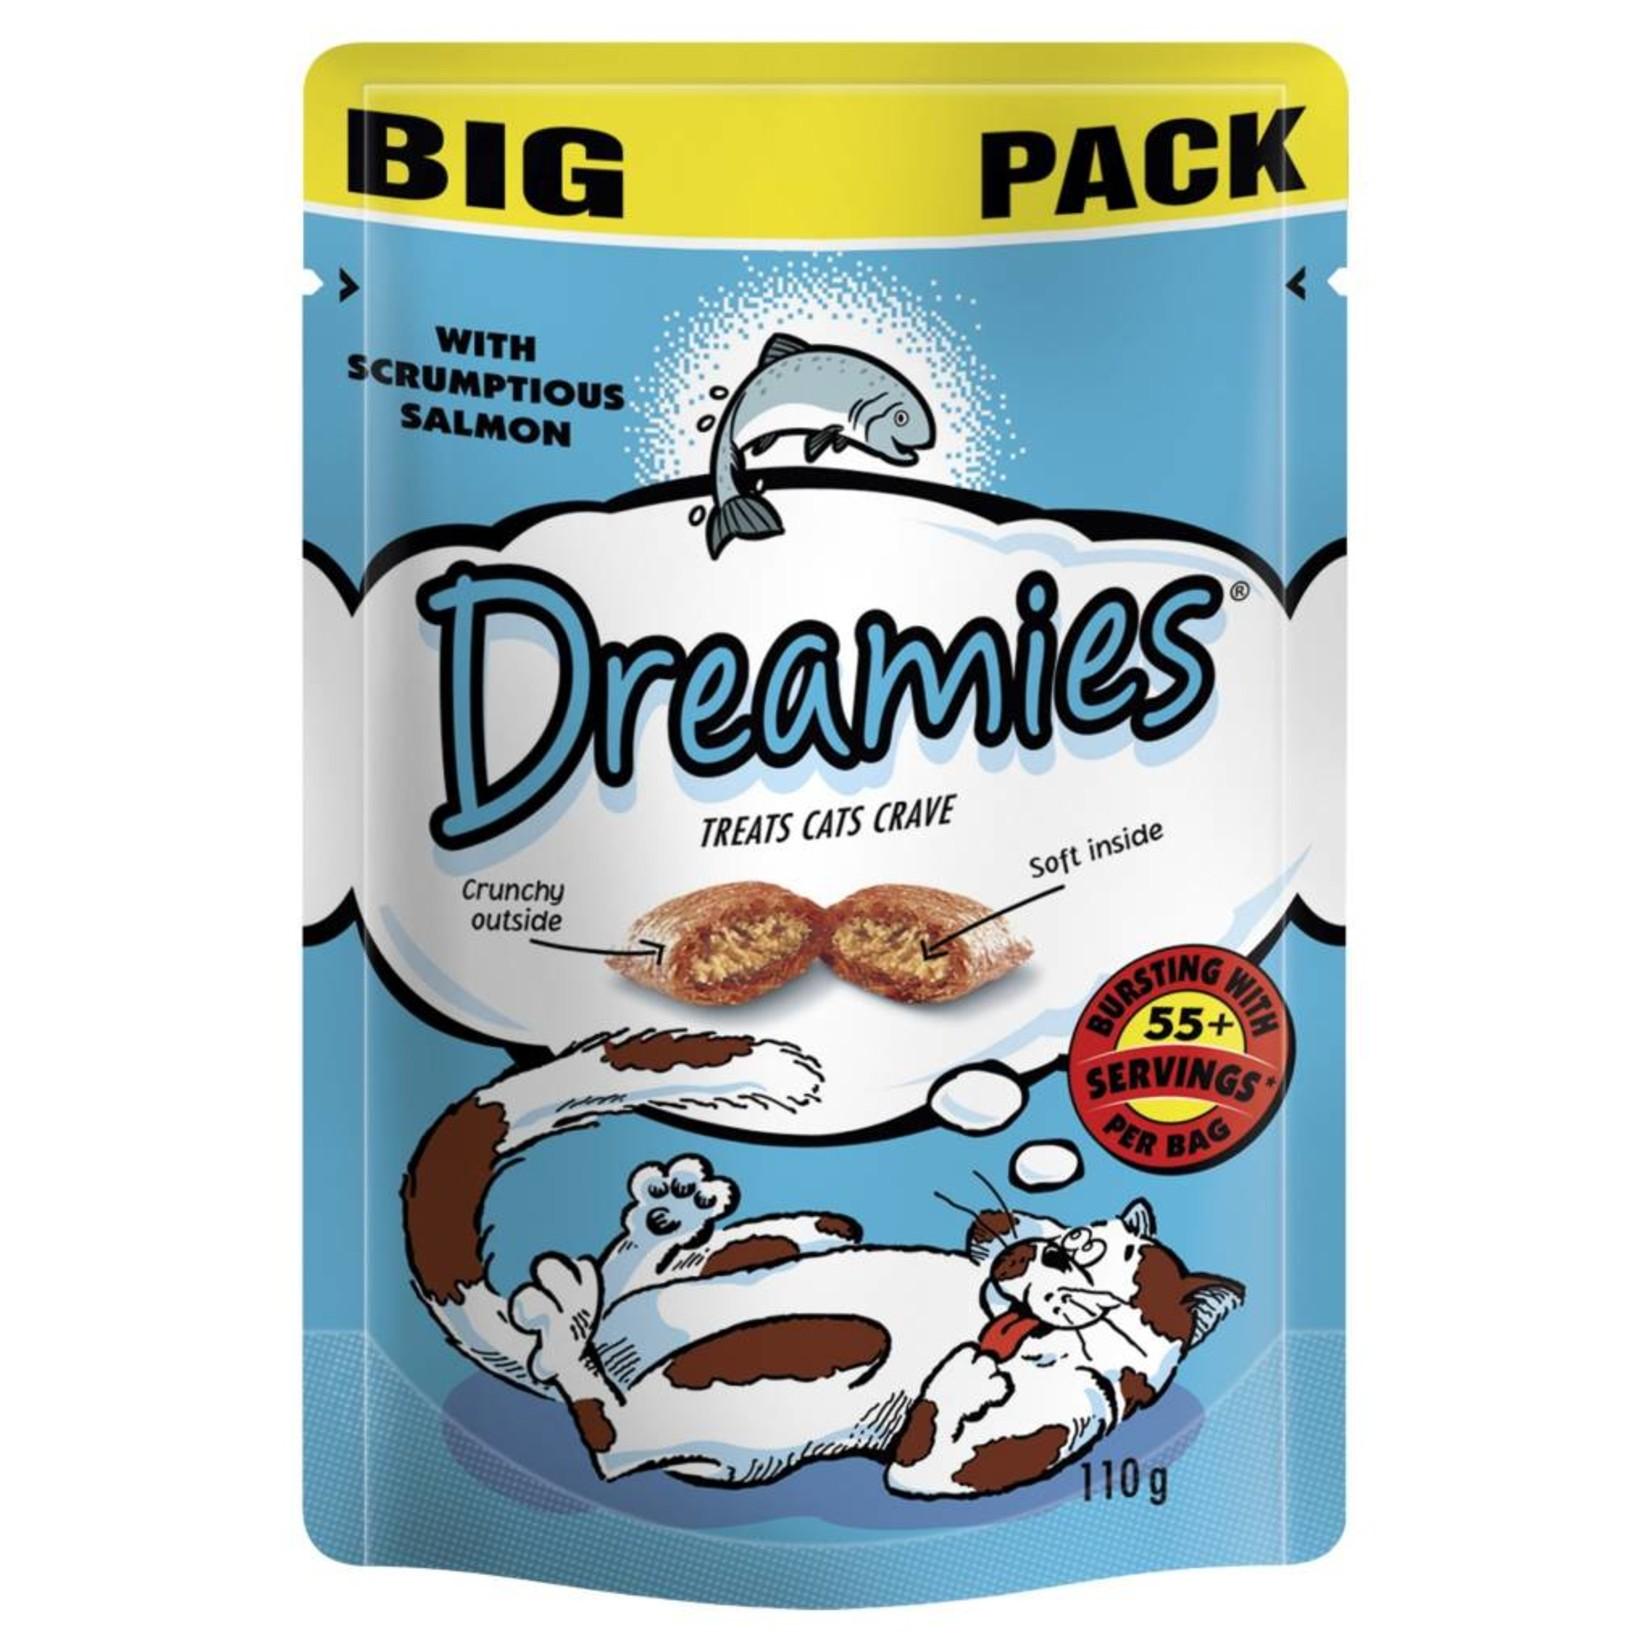 Dreamies Cat Treats Mega Pack Salmon, 200g